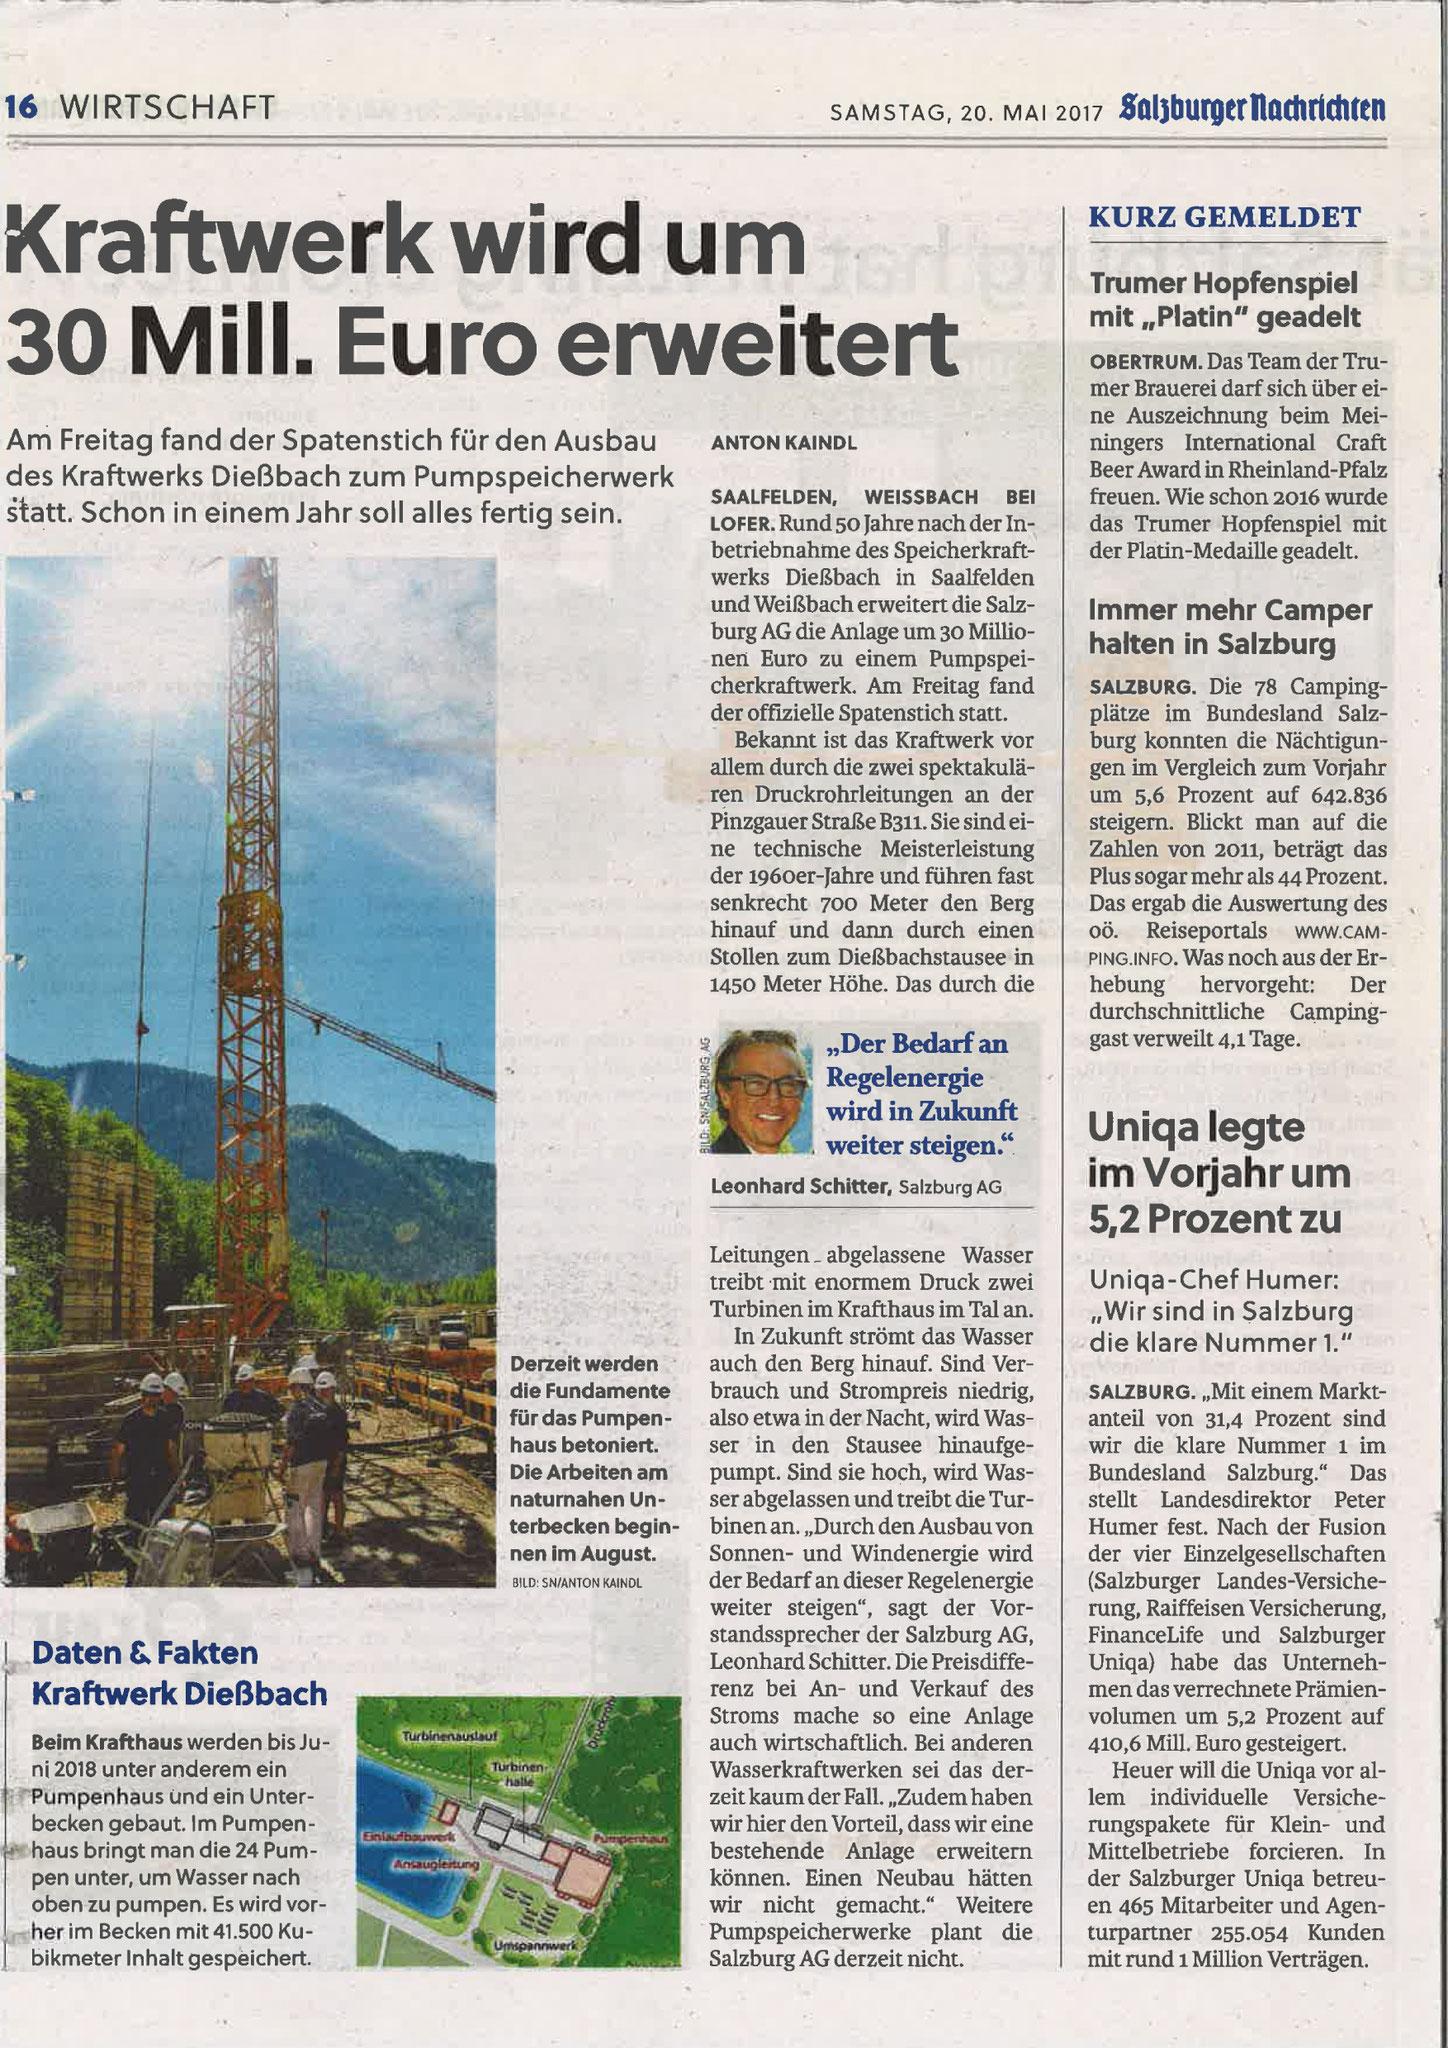 Salzburger Nachrichten, 20. Mai 2017